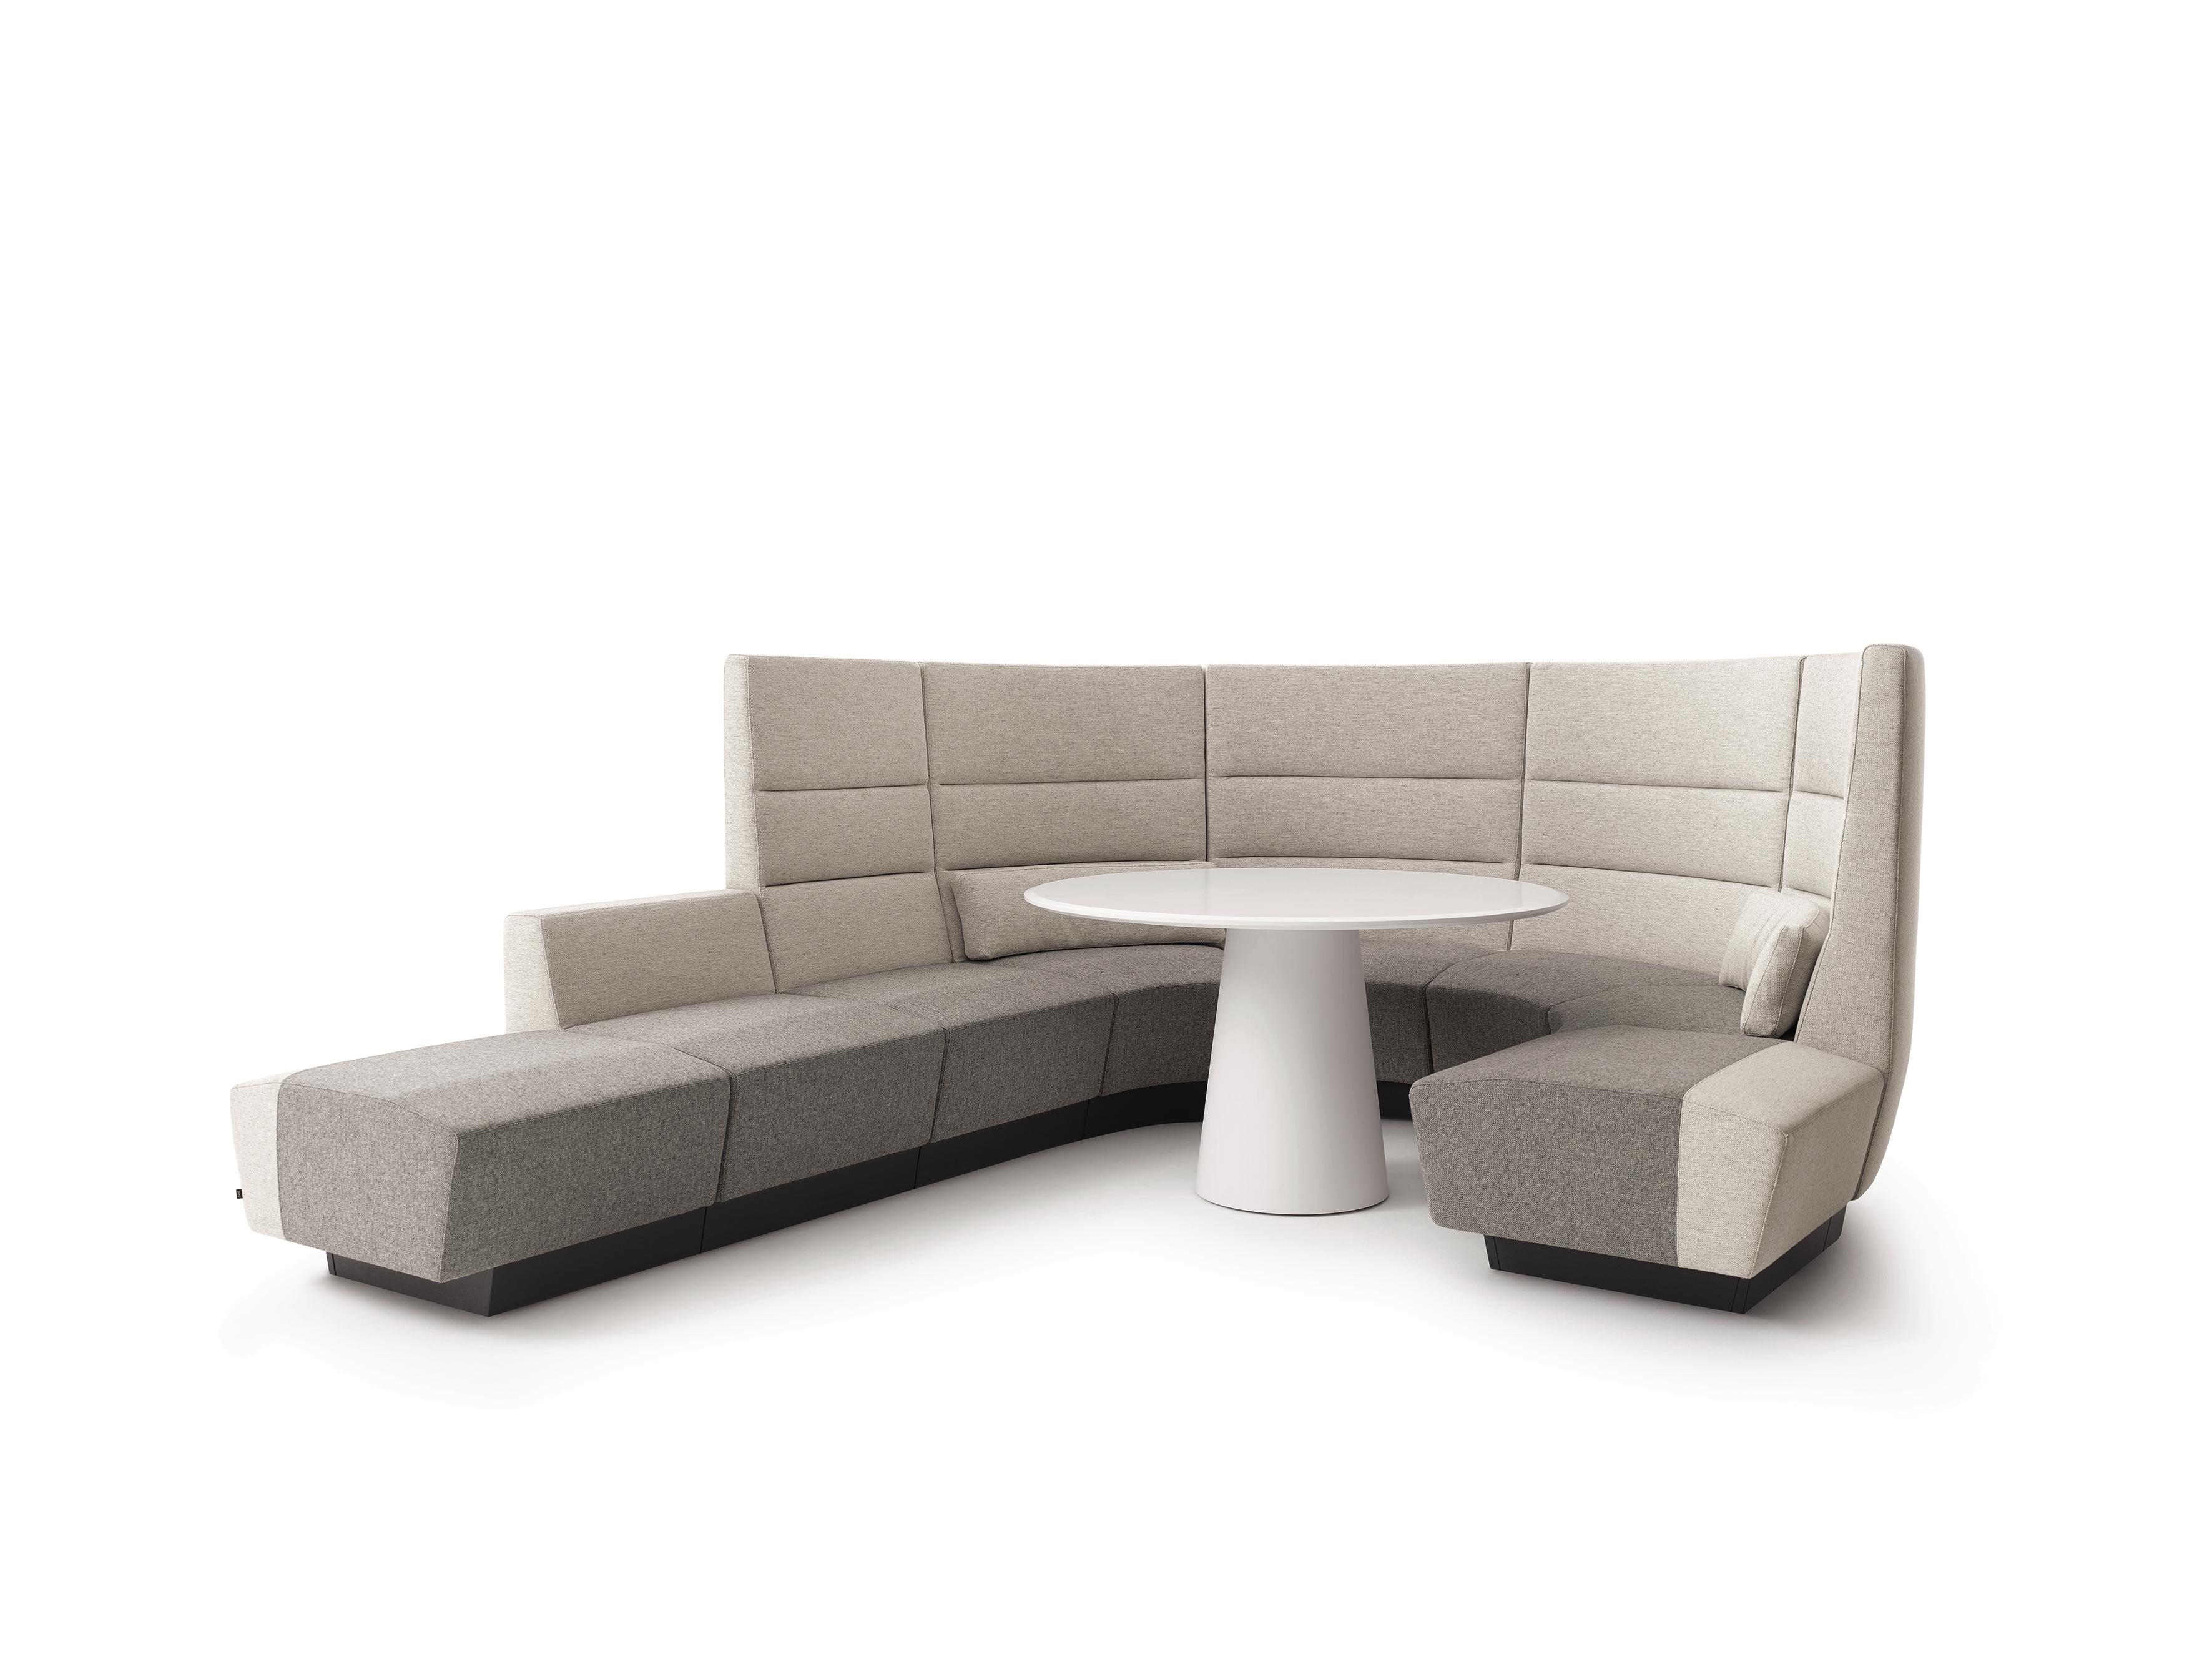 Affair Sofa Professional: COR